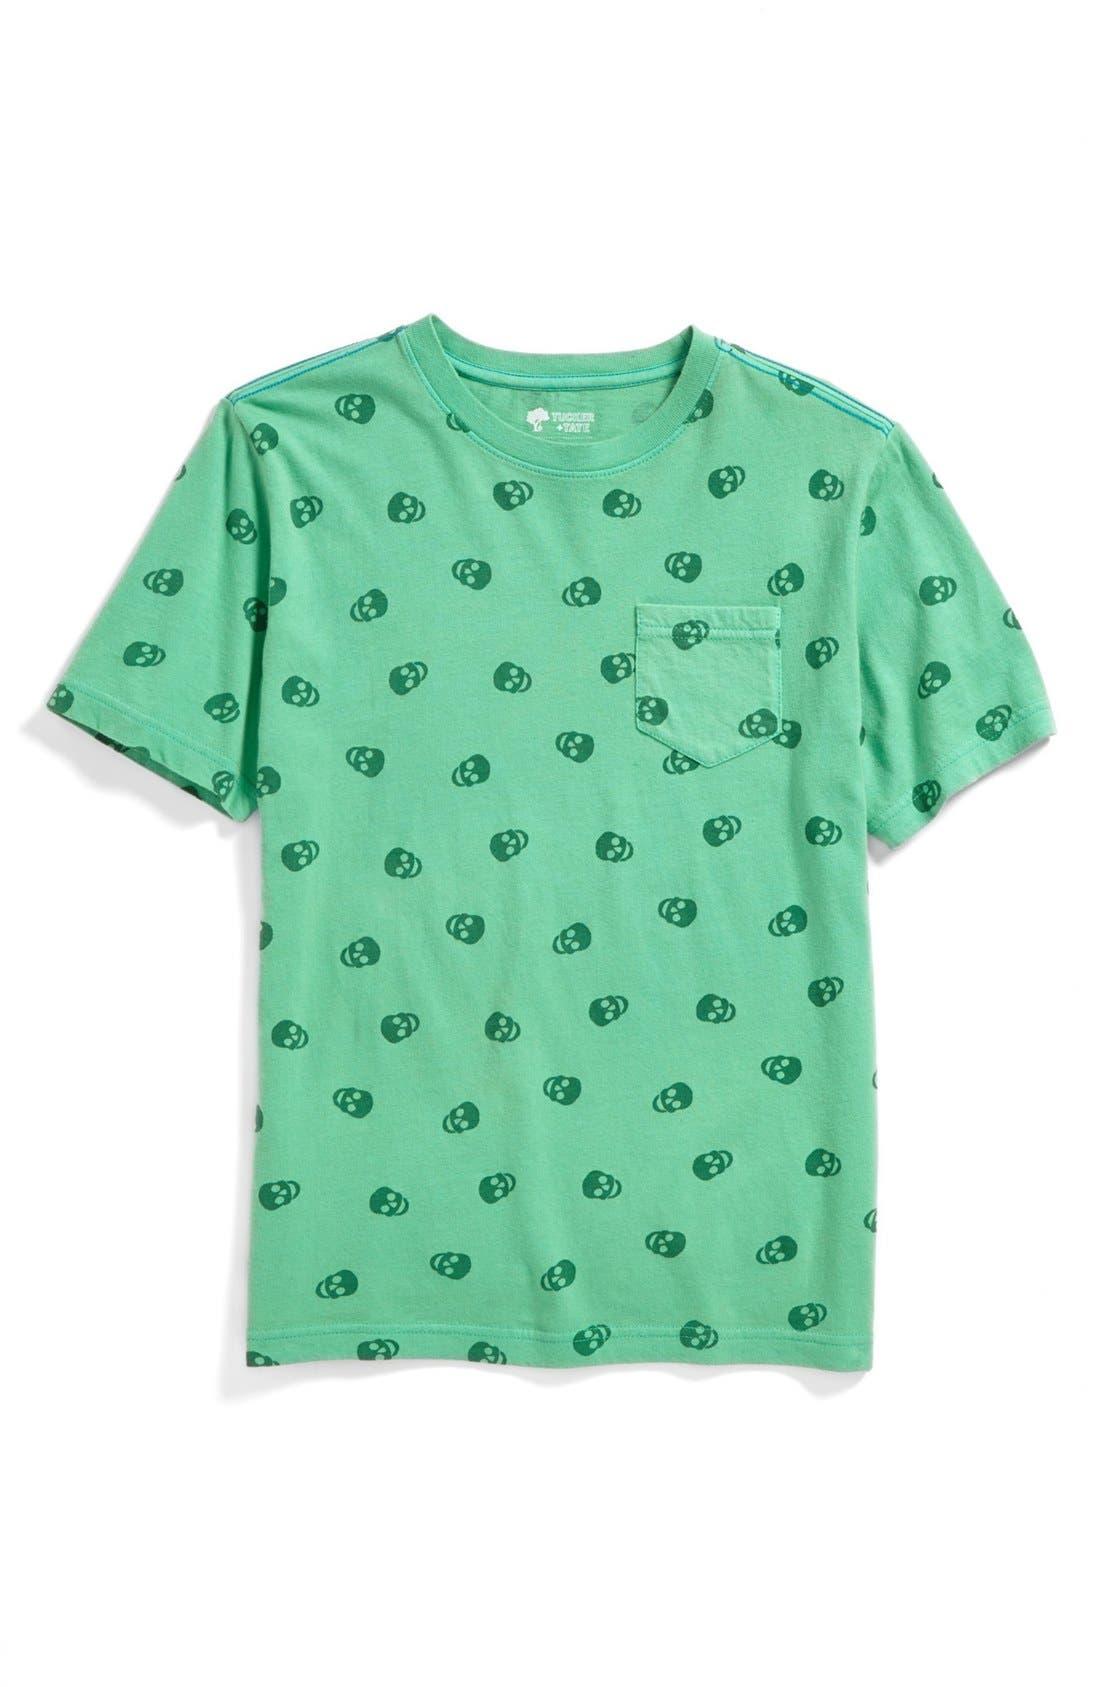 Alternate Image 1 Selected - Tucker + Tate 'Oscar' Overdyed T-Shirt (Big Boys)